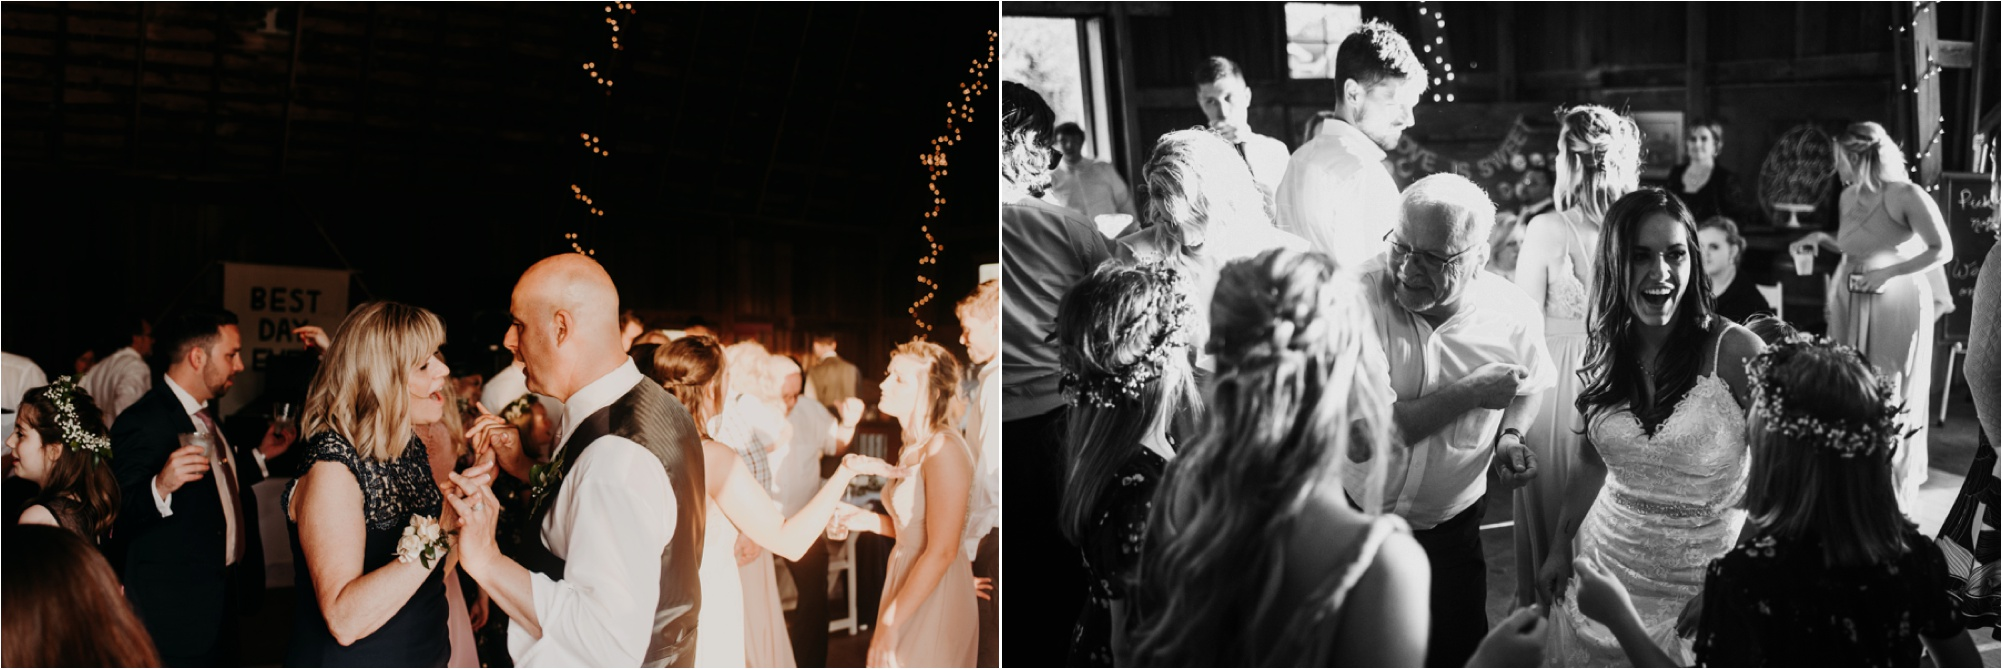 The Barn and Black Ridge Wedding Minneapolis Wedding Photographer_4172.jpg